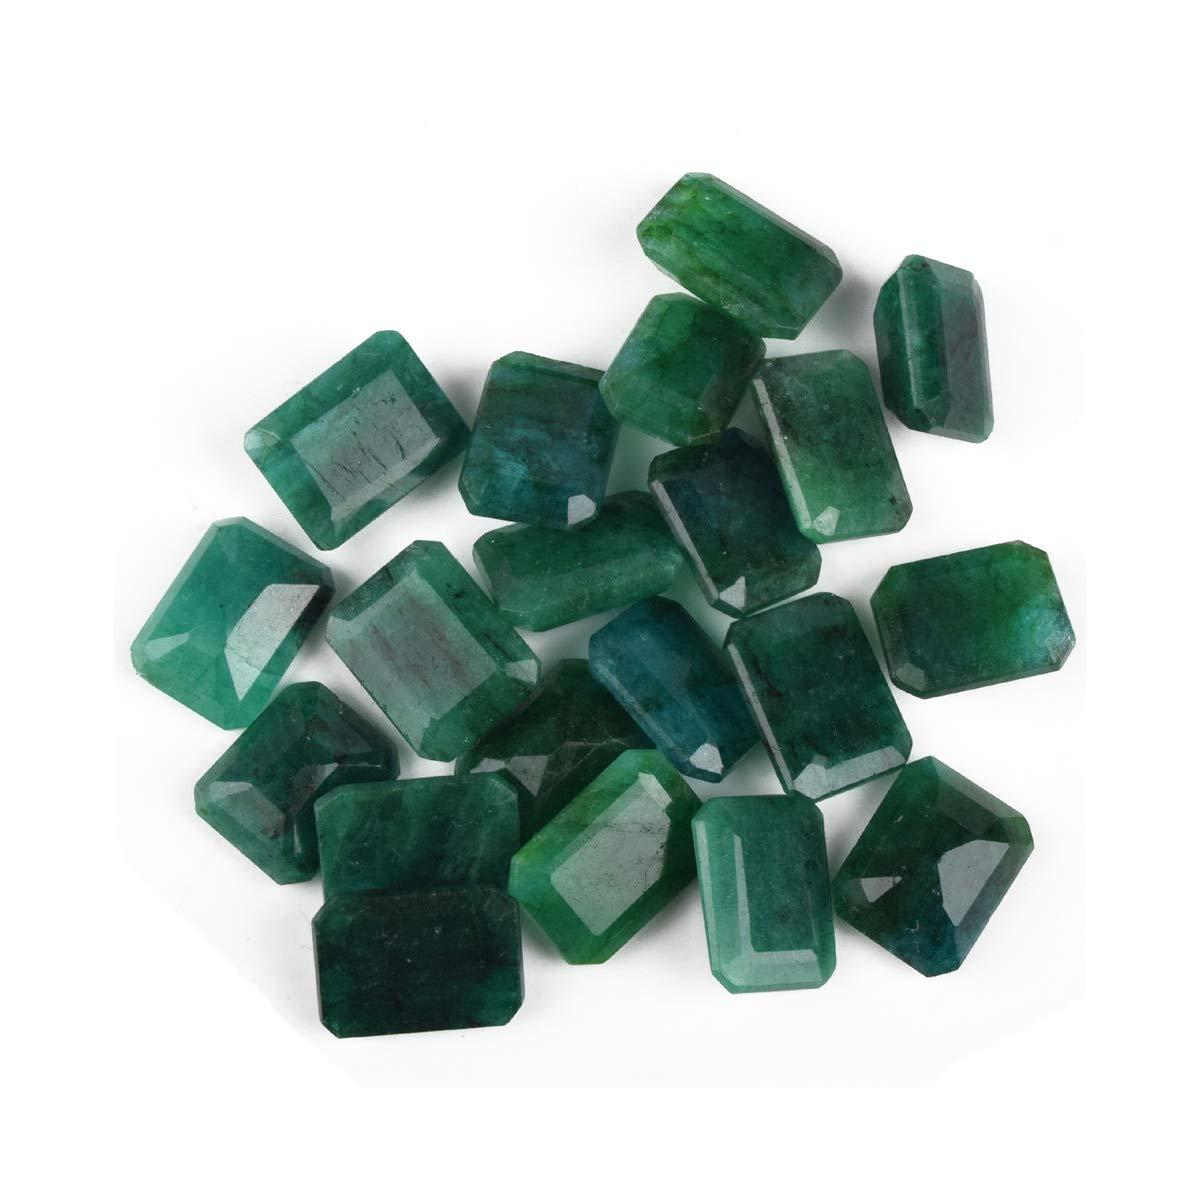 Zambian AAA++ Grade Green Emerald 200 Cts. Fine 20 Pieces Natural Green Emerald Loose Gemstones Lot